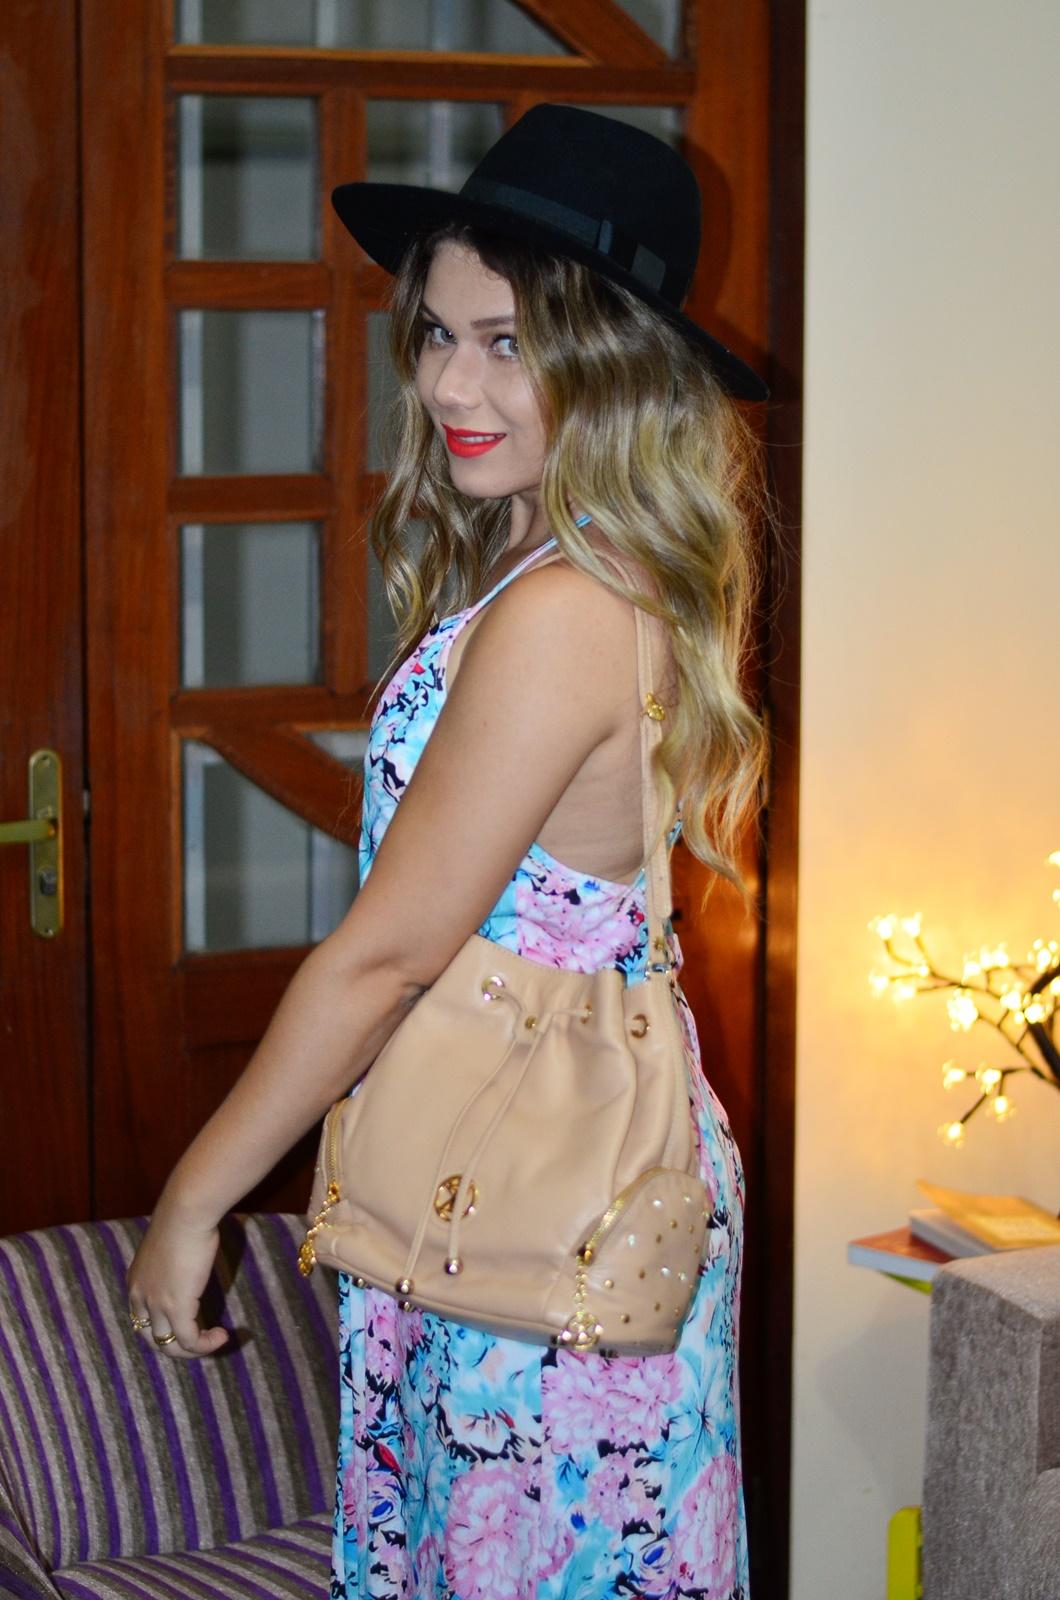 vestido longo floral + chapeu + bolsa saco 7